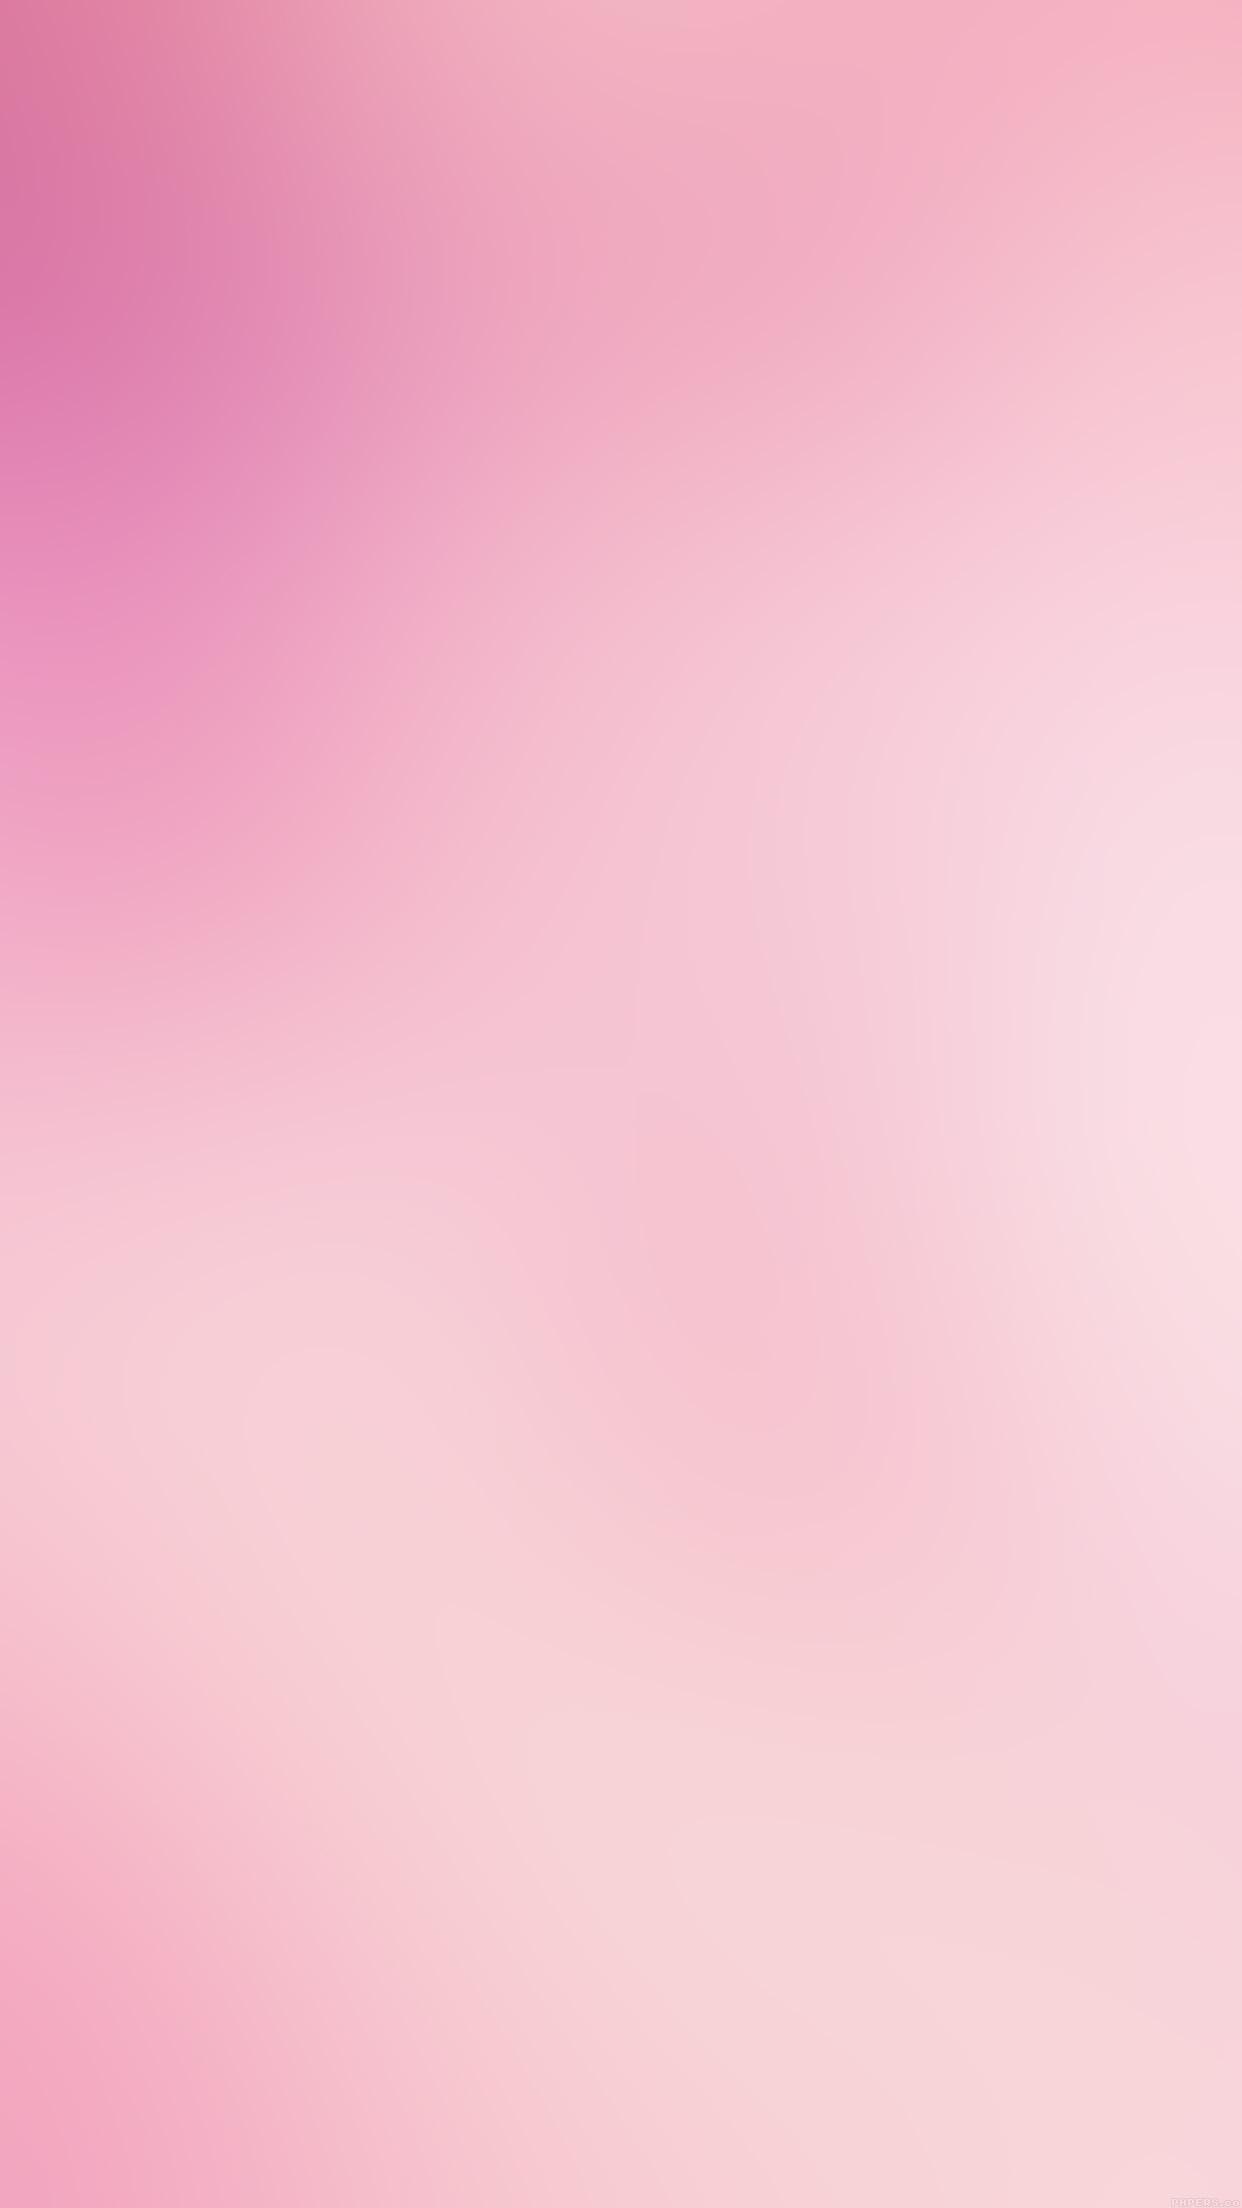 Wallpaper iphone 7 plus pink